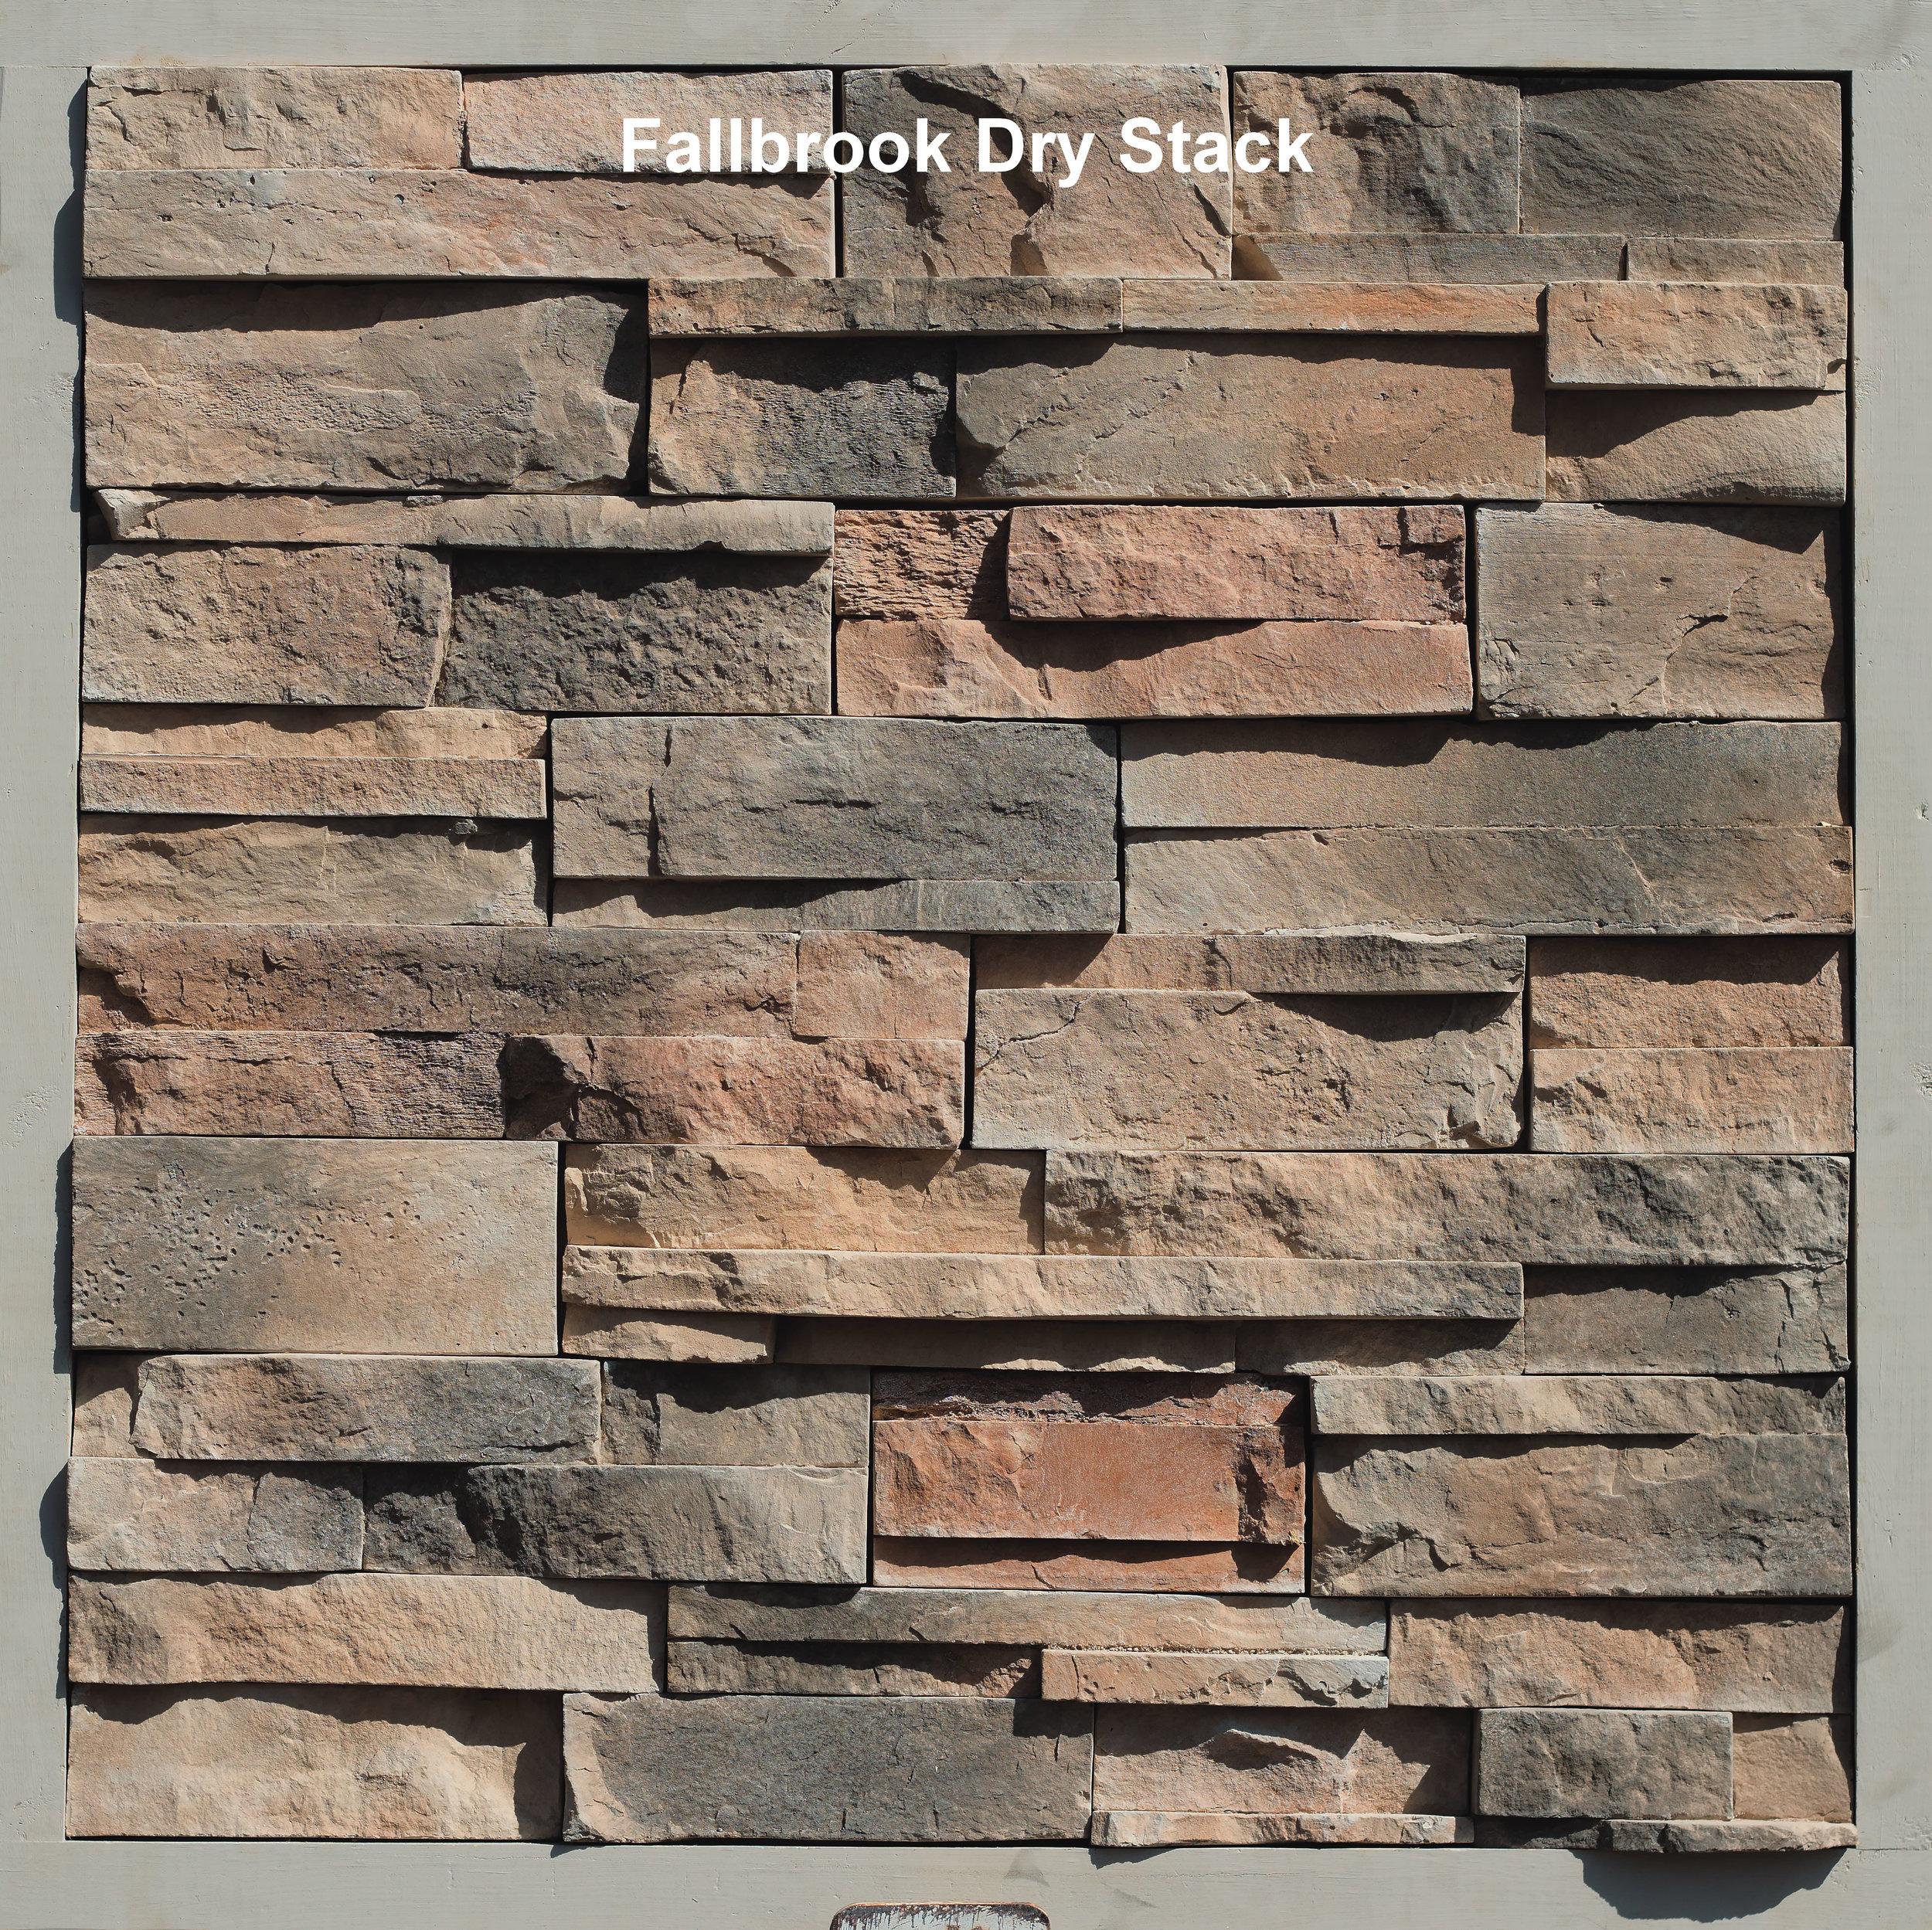 DQ_Dry Stack_Fallbrook_Profile_Rev_5-19.jpg